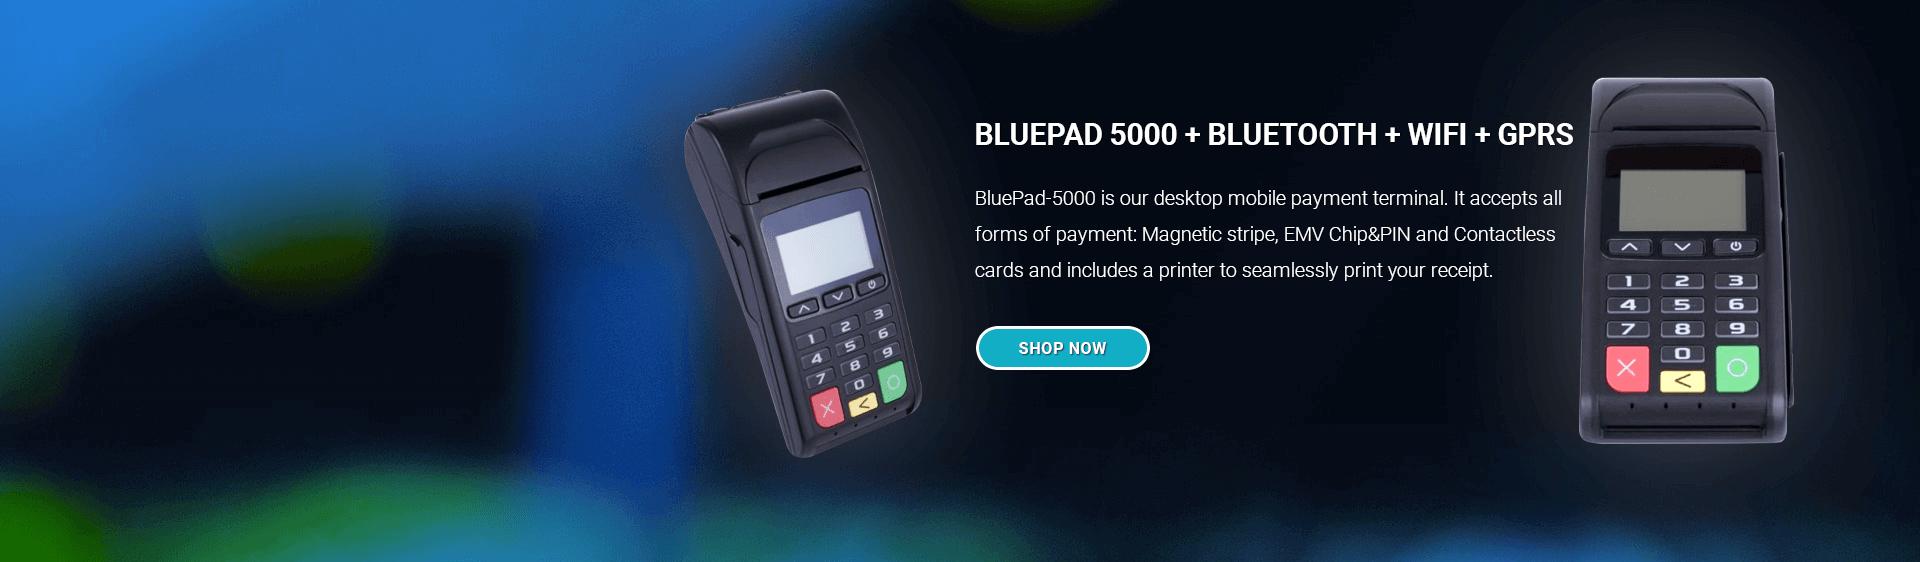 Bluepad 5000 + Bluetooth ...